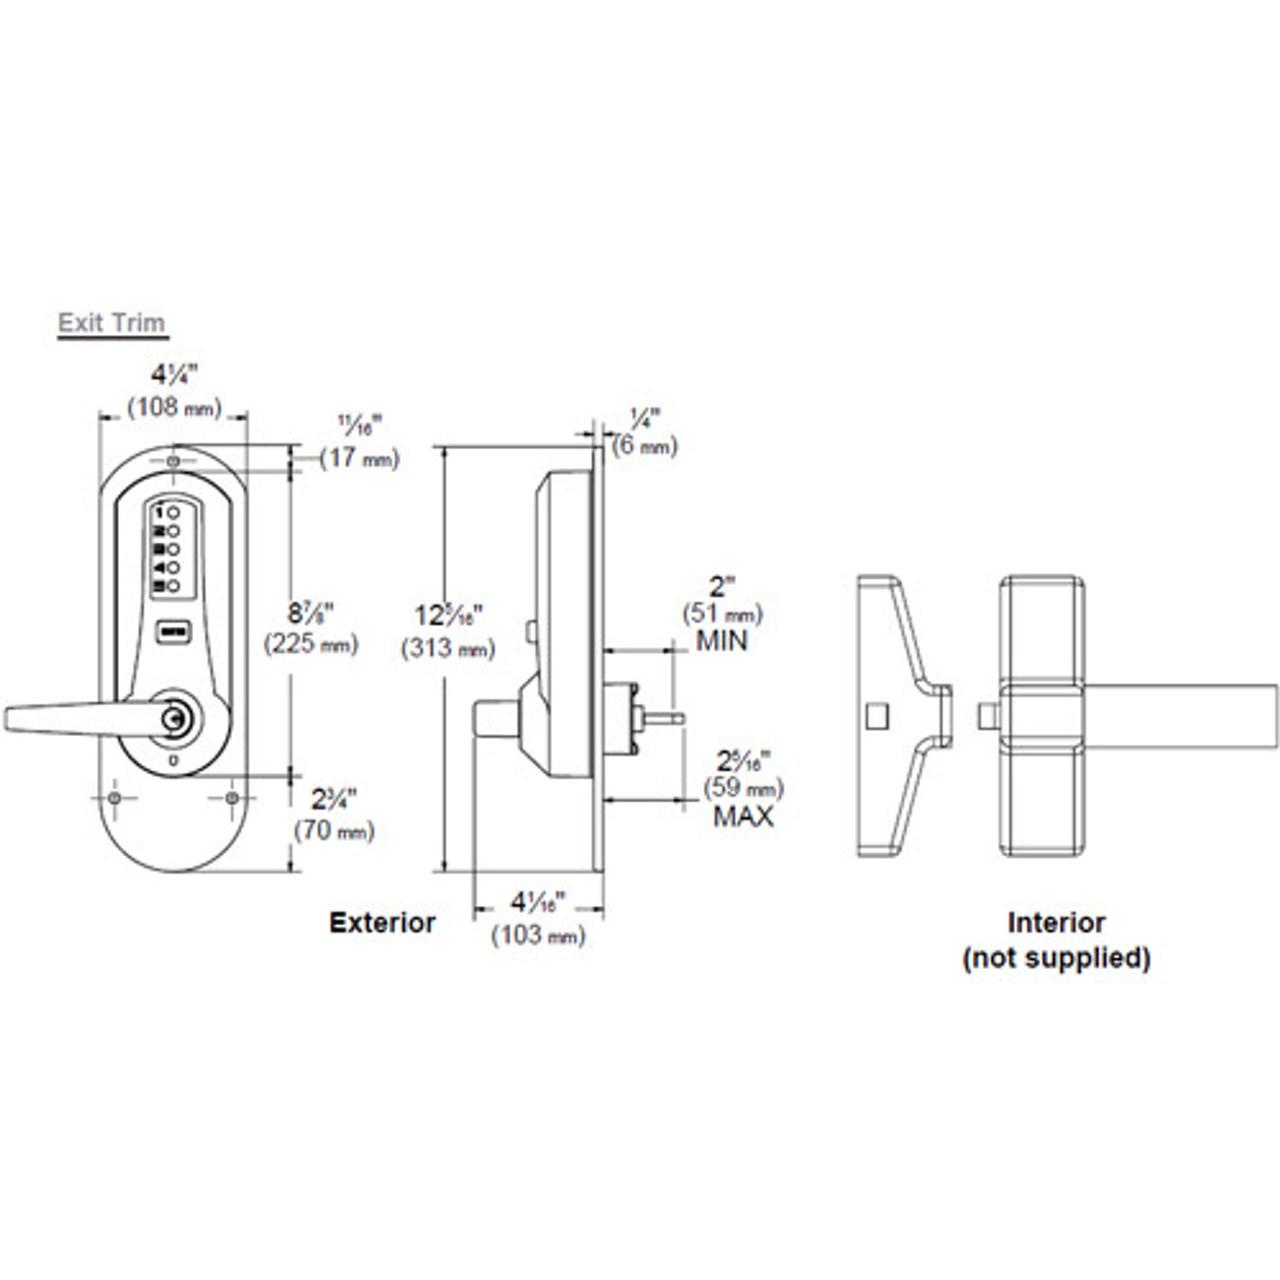 simplex pushbutton with exit trim [ 1280 x 1280 Pixel ]